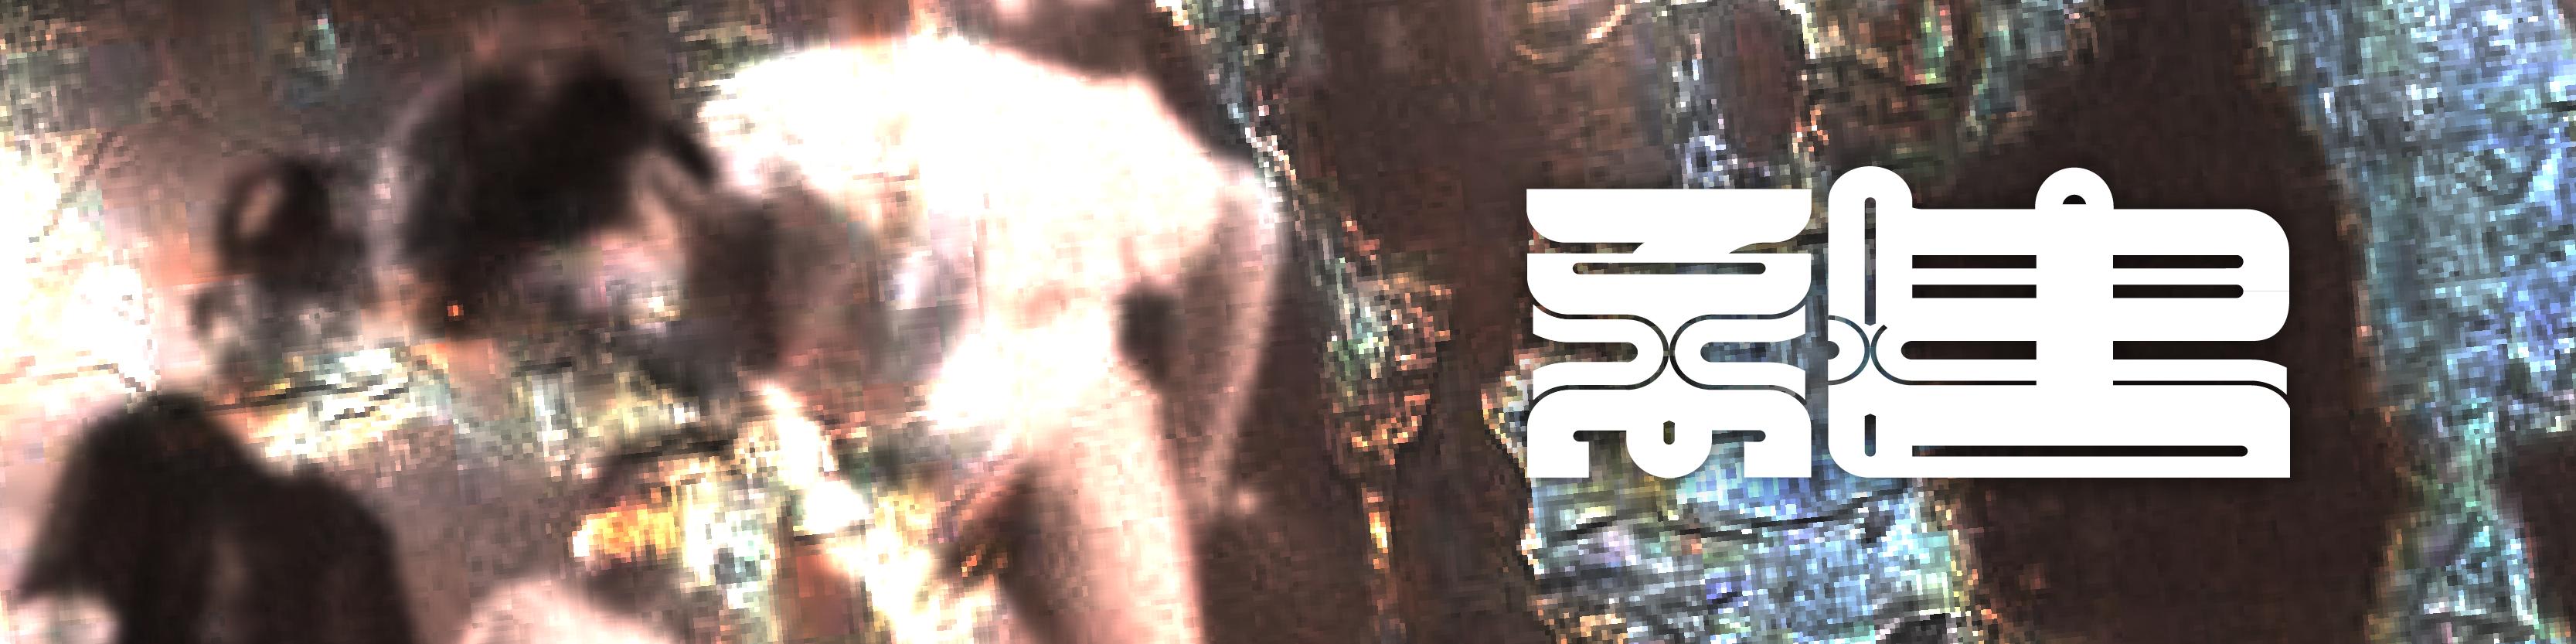 kd7_ptd_banner-09